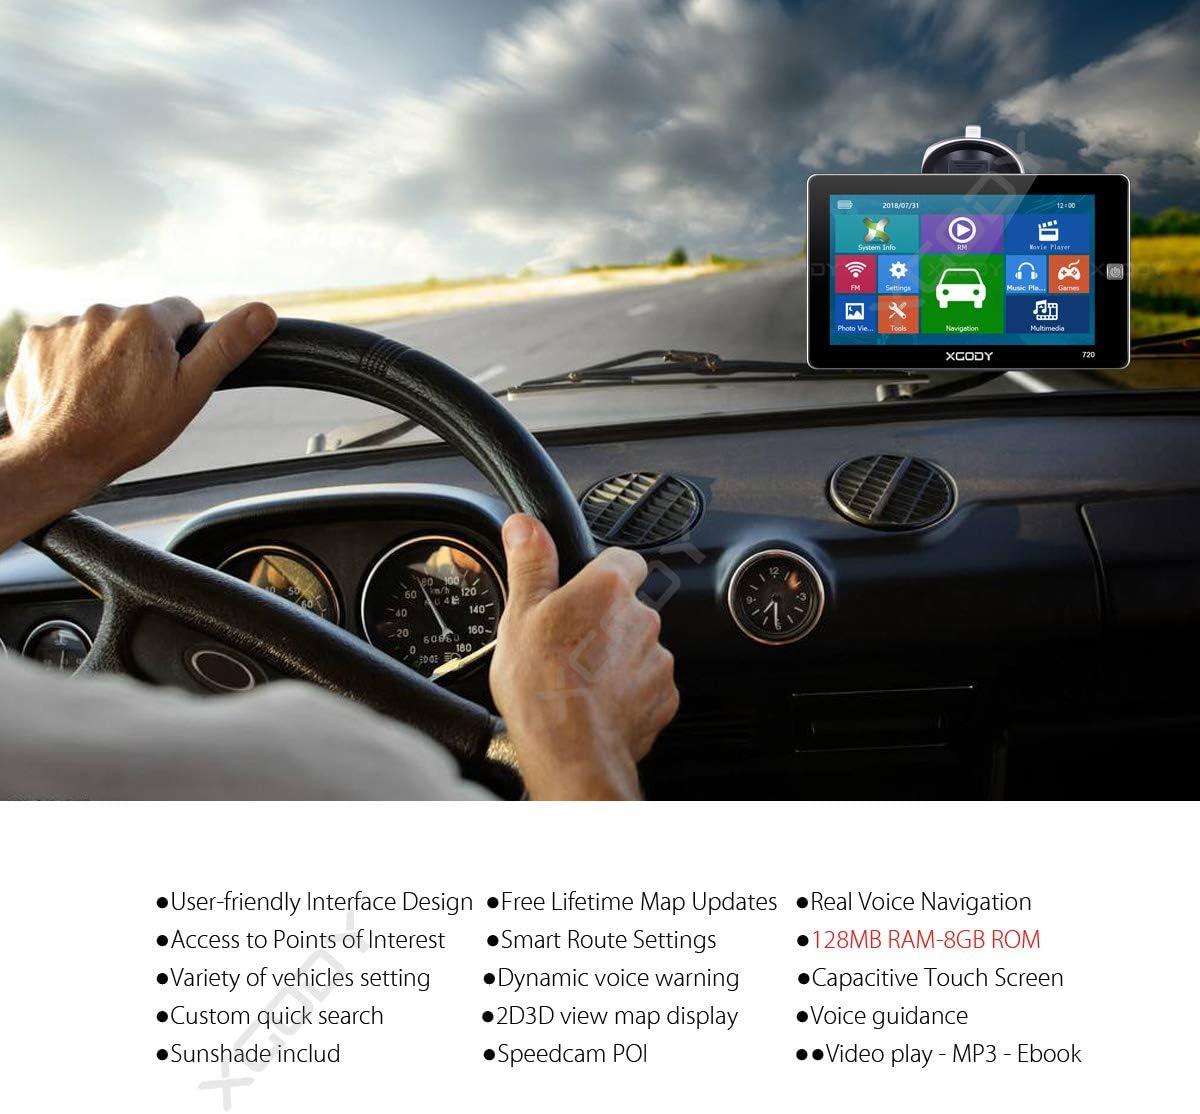 Xgody 720F GPS Navigation pour Voiture Xgody 5 HD /Écran Tactile HGV GPS Syst/ème avec rep/ères Spoken Turn by Turn Directions Recherche Poi Free Lifetime UK//Ireland Maps Update